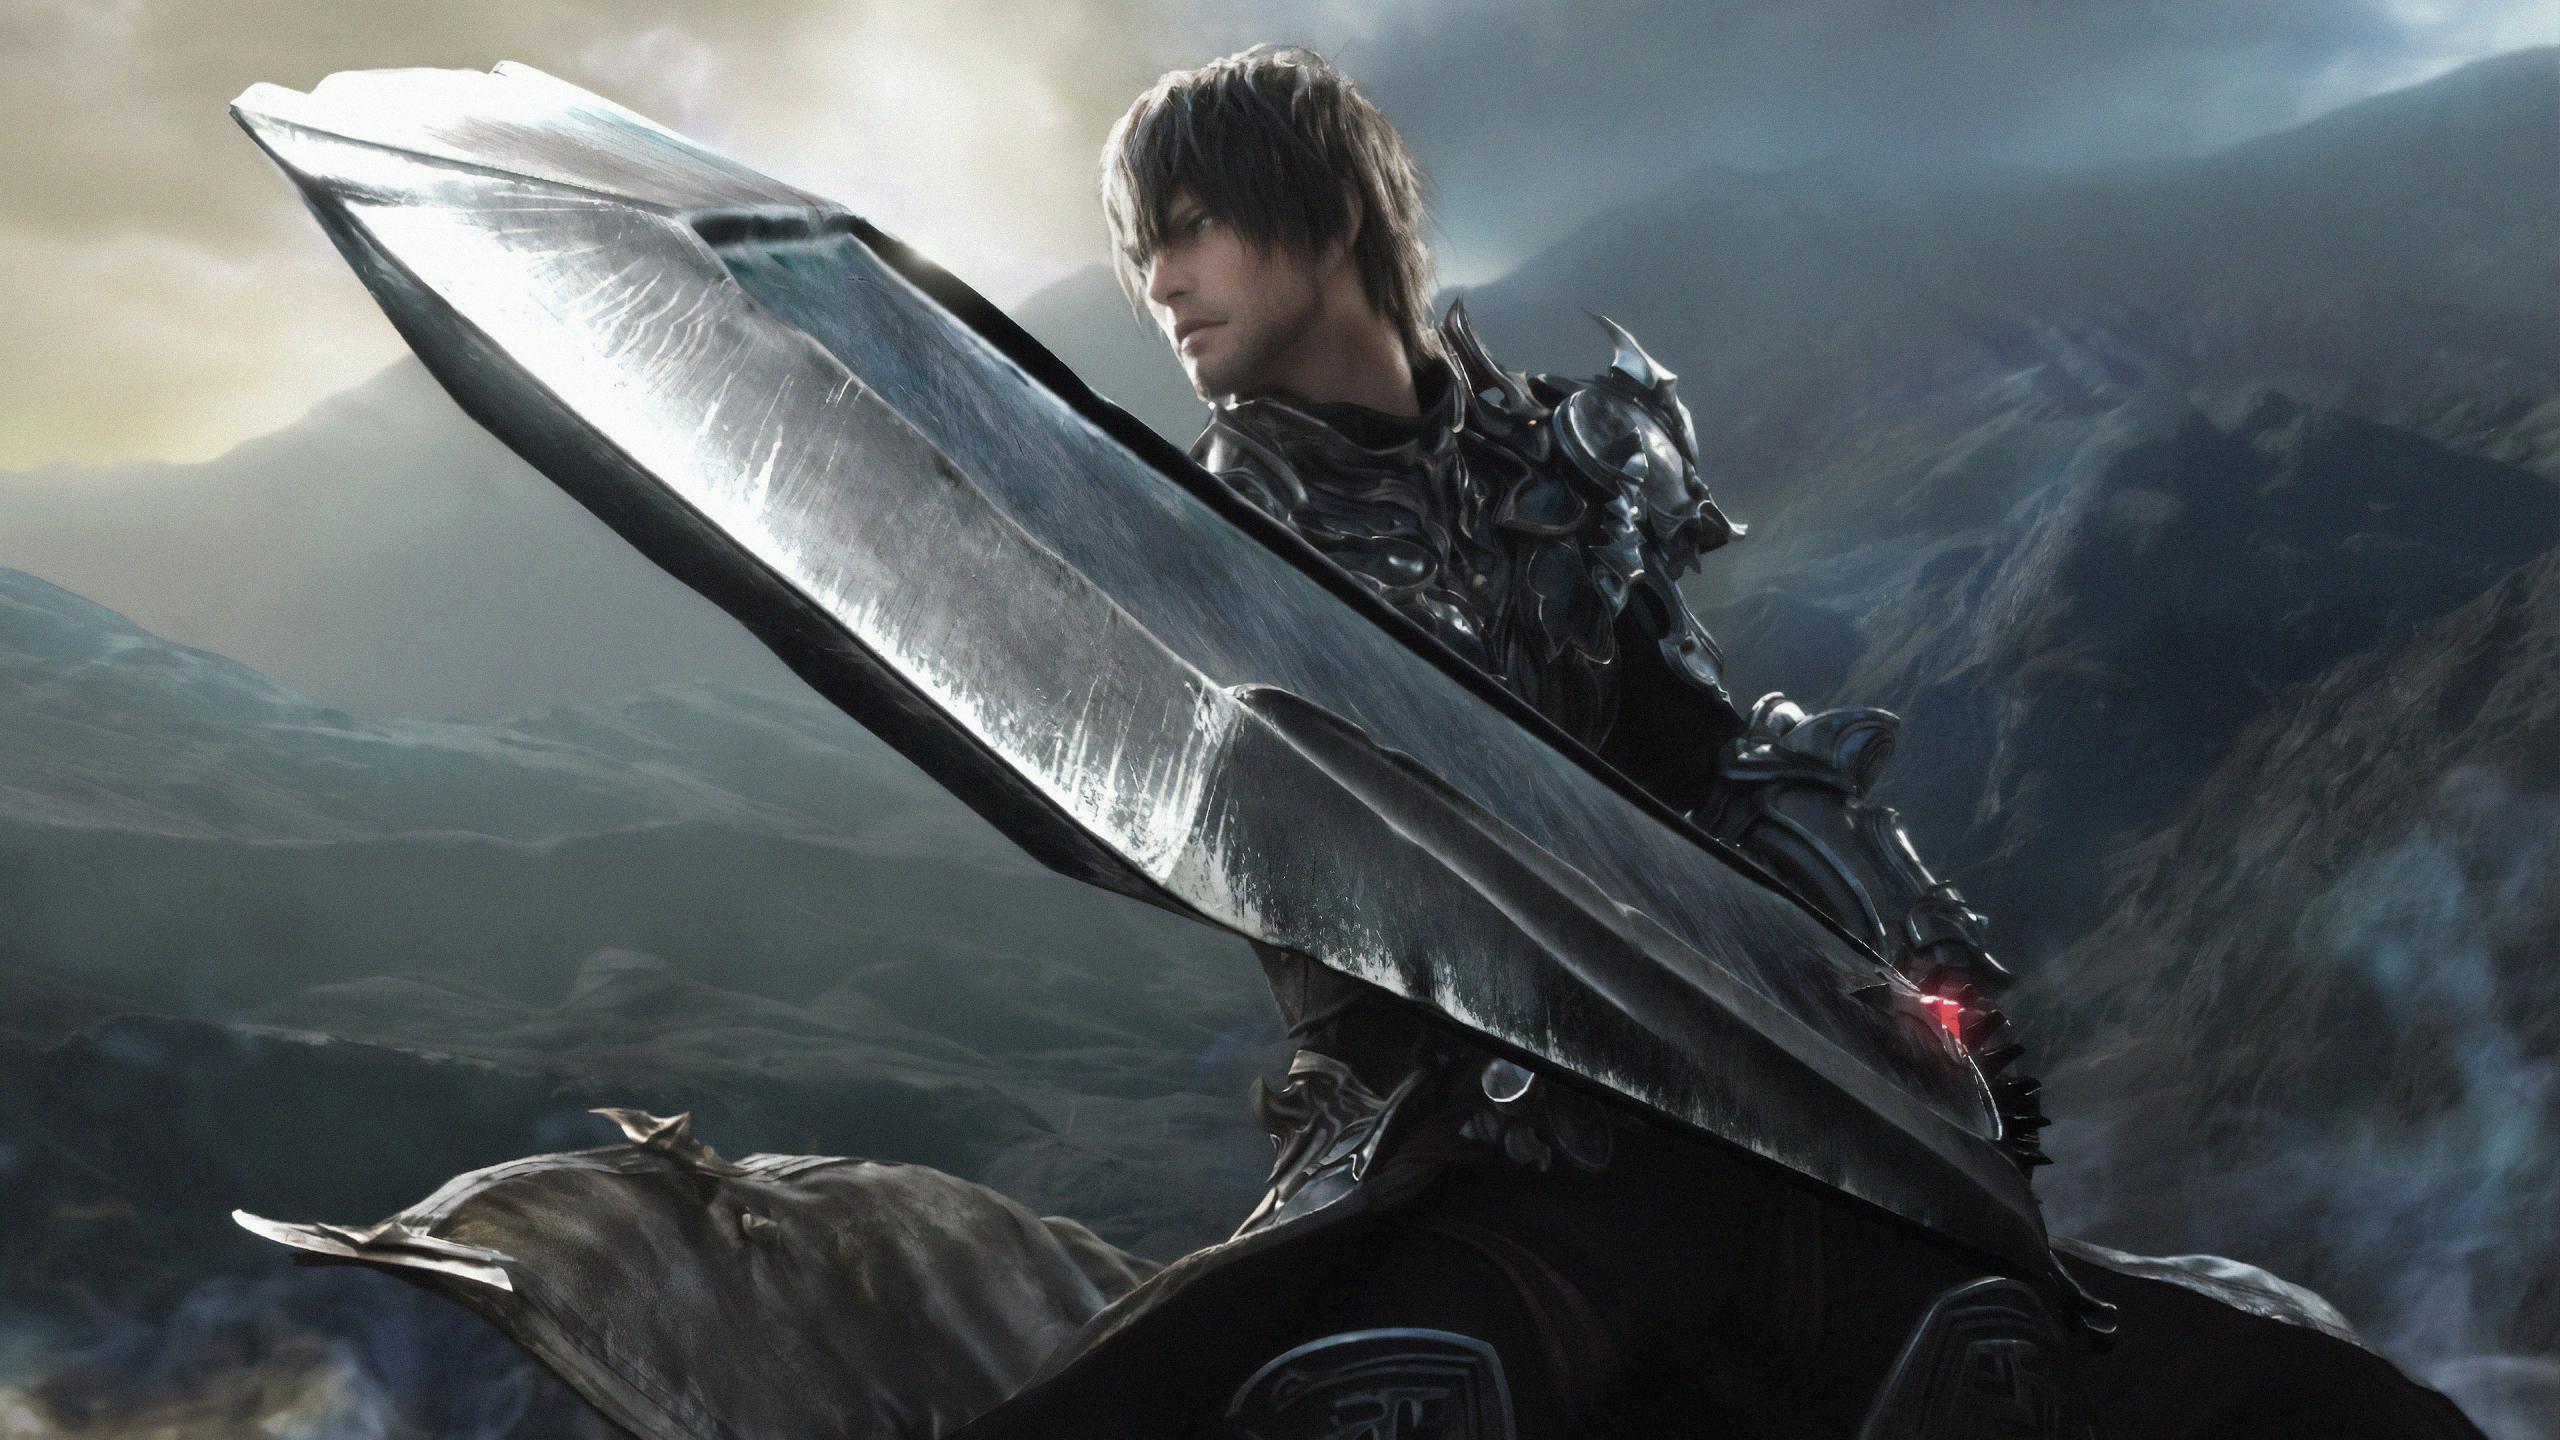 2560x1440 Final Fantasy 14 Shadowbringers 1440p Resolution